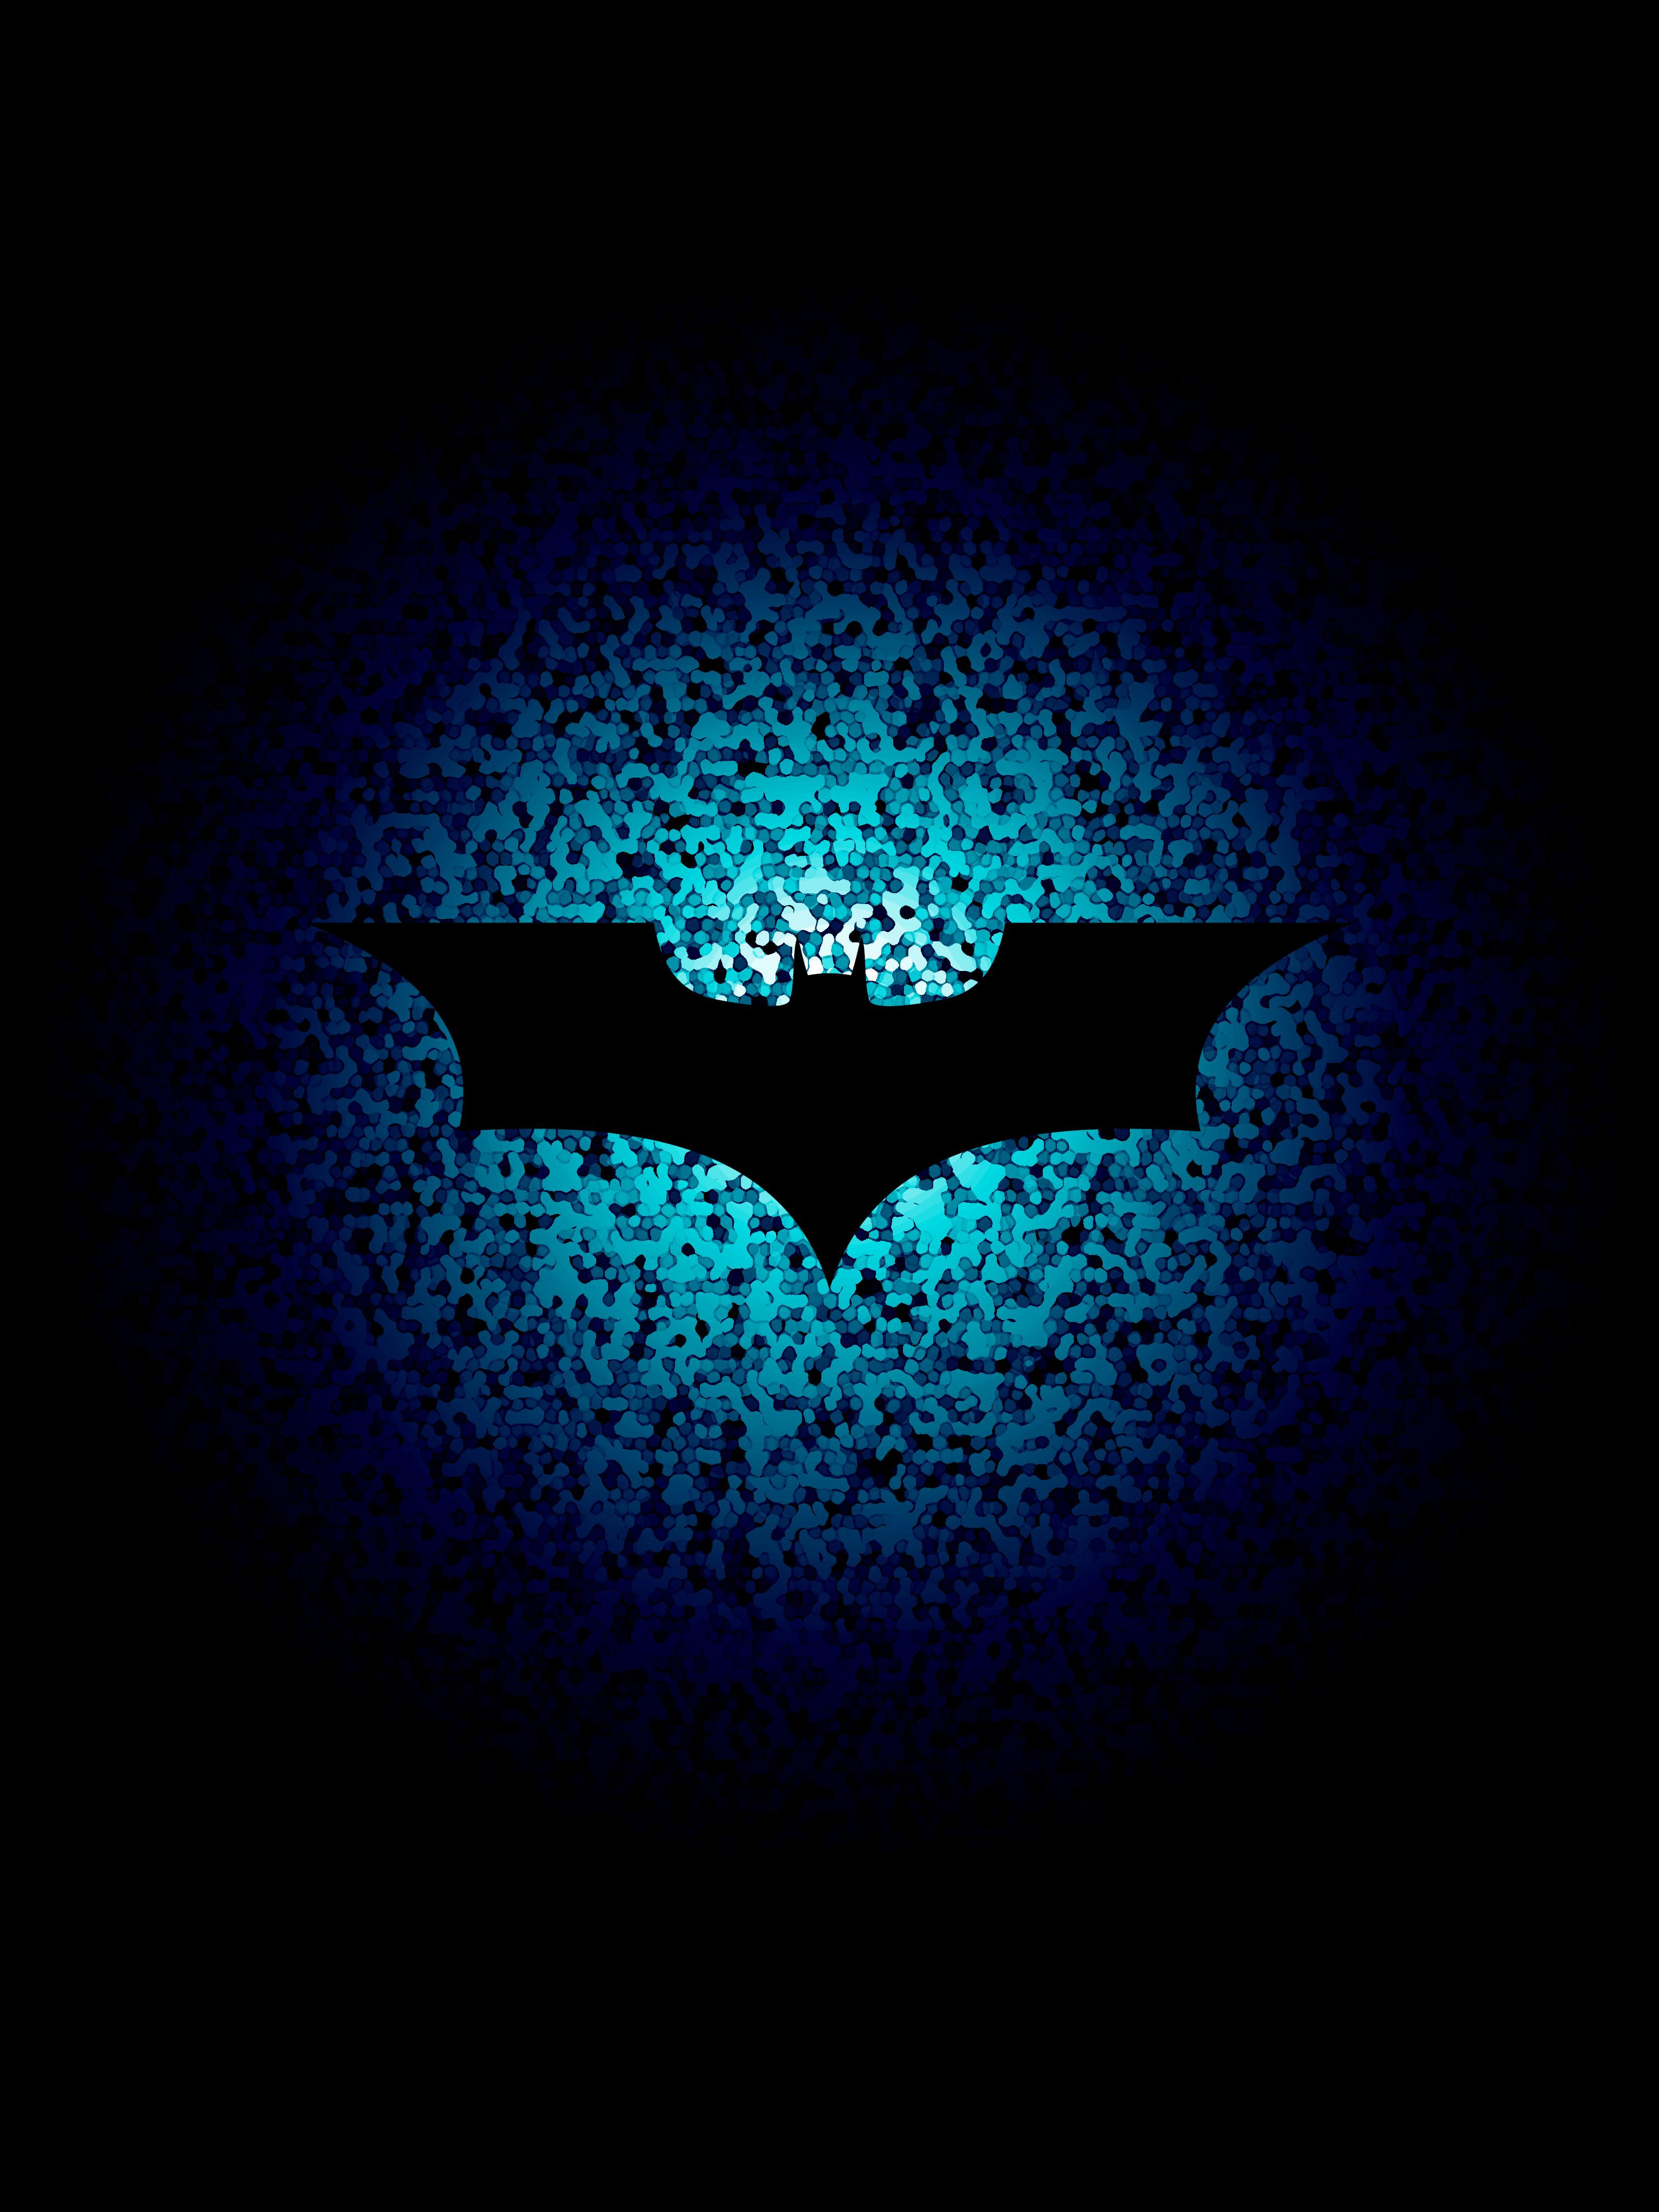 The Dark Knight Rises V.2 - HD Wallpaper By ...